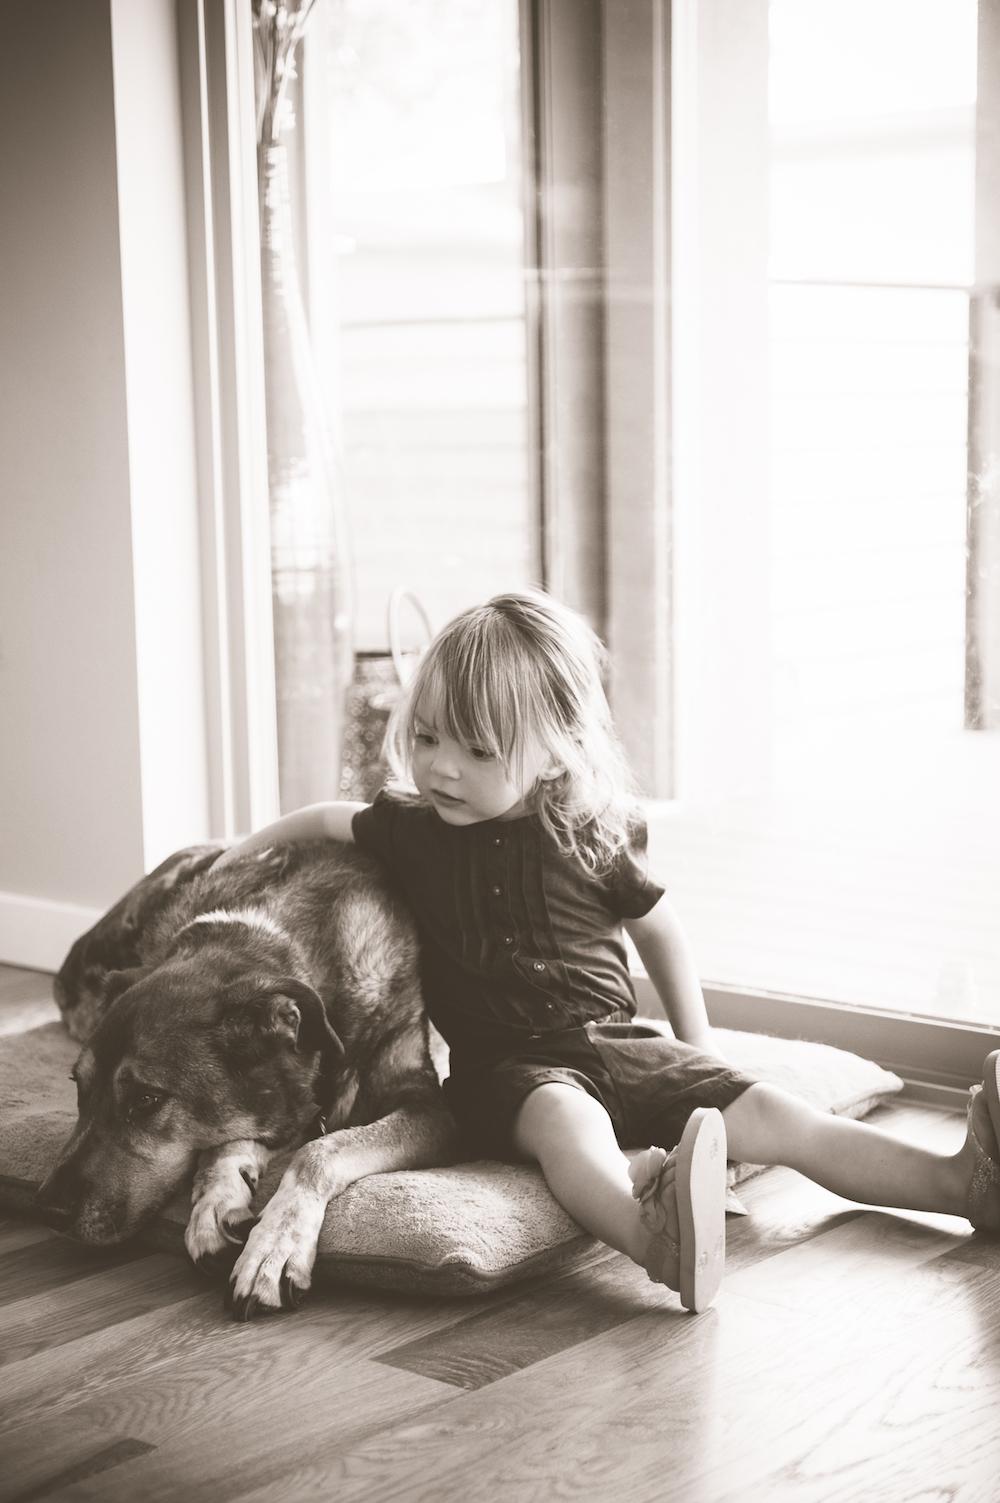 ck-Colorado-Maternity-Baby-Photography-0040.jpg